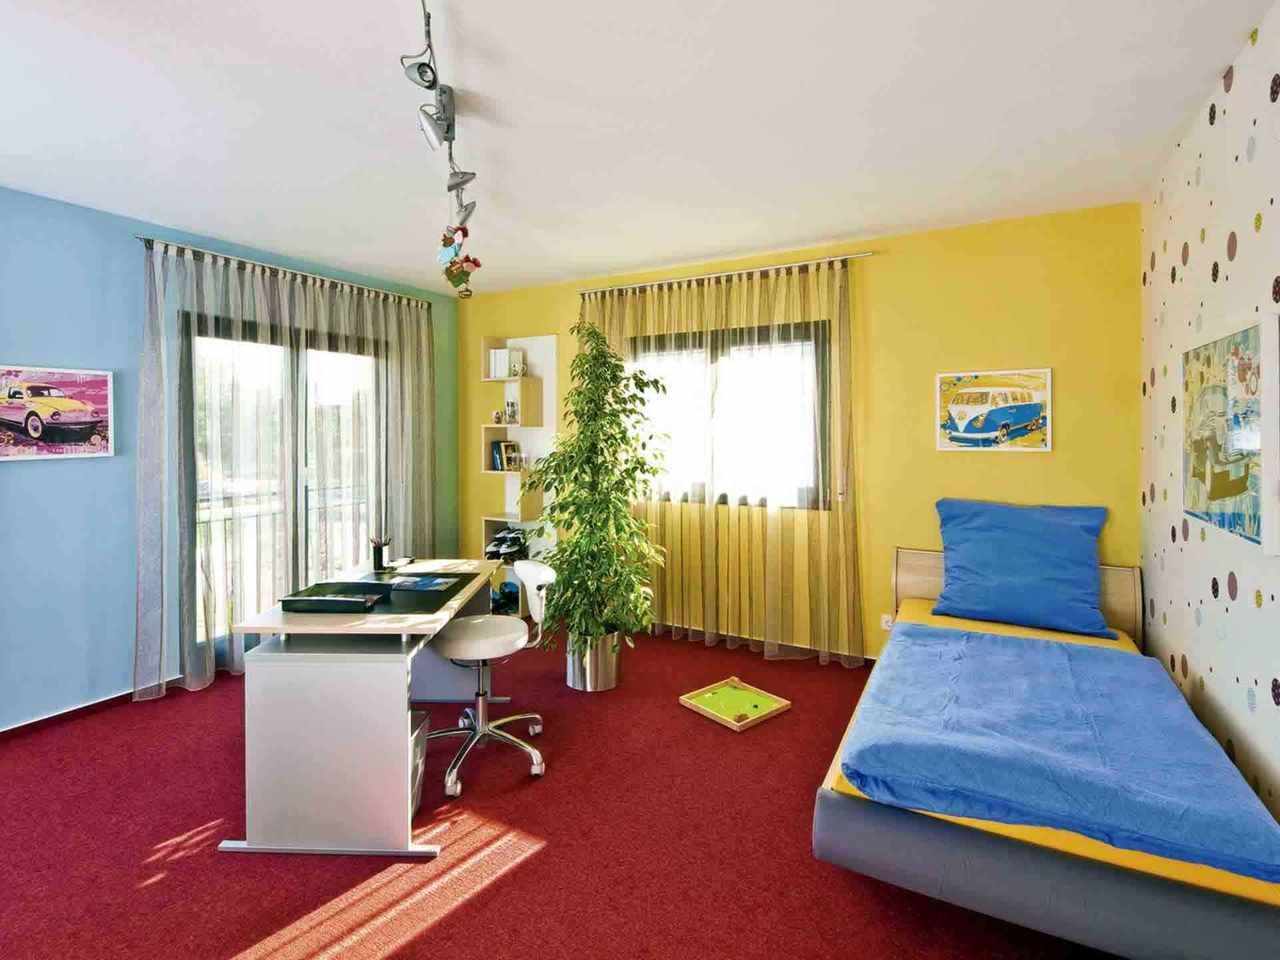 Haus City 600 - WeberHaus Kinderzimmer